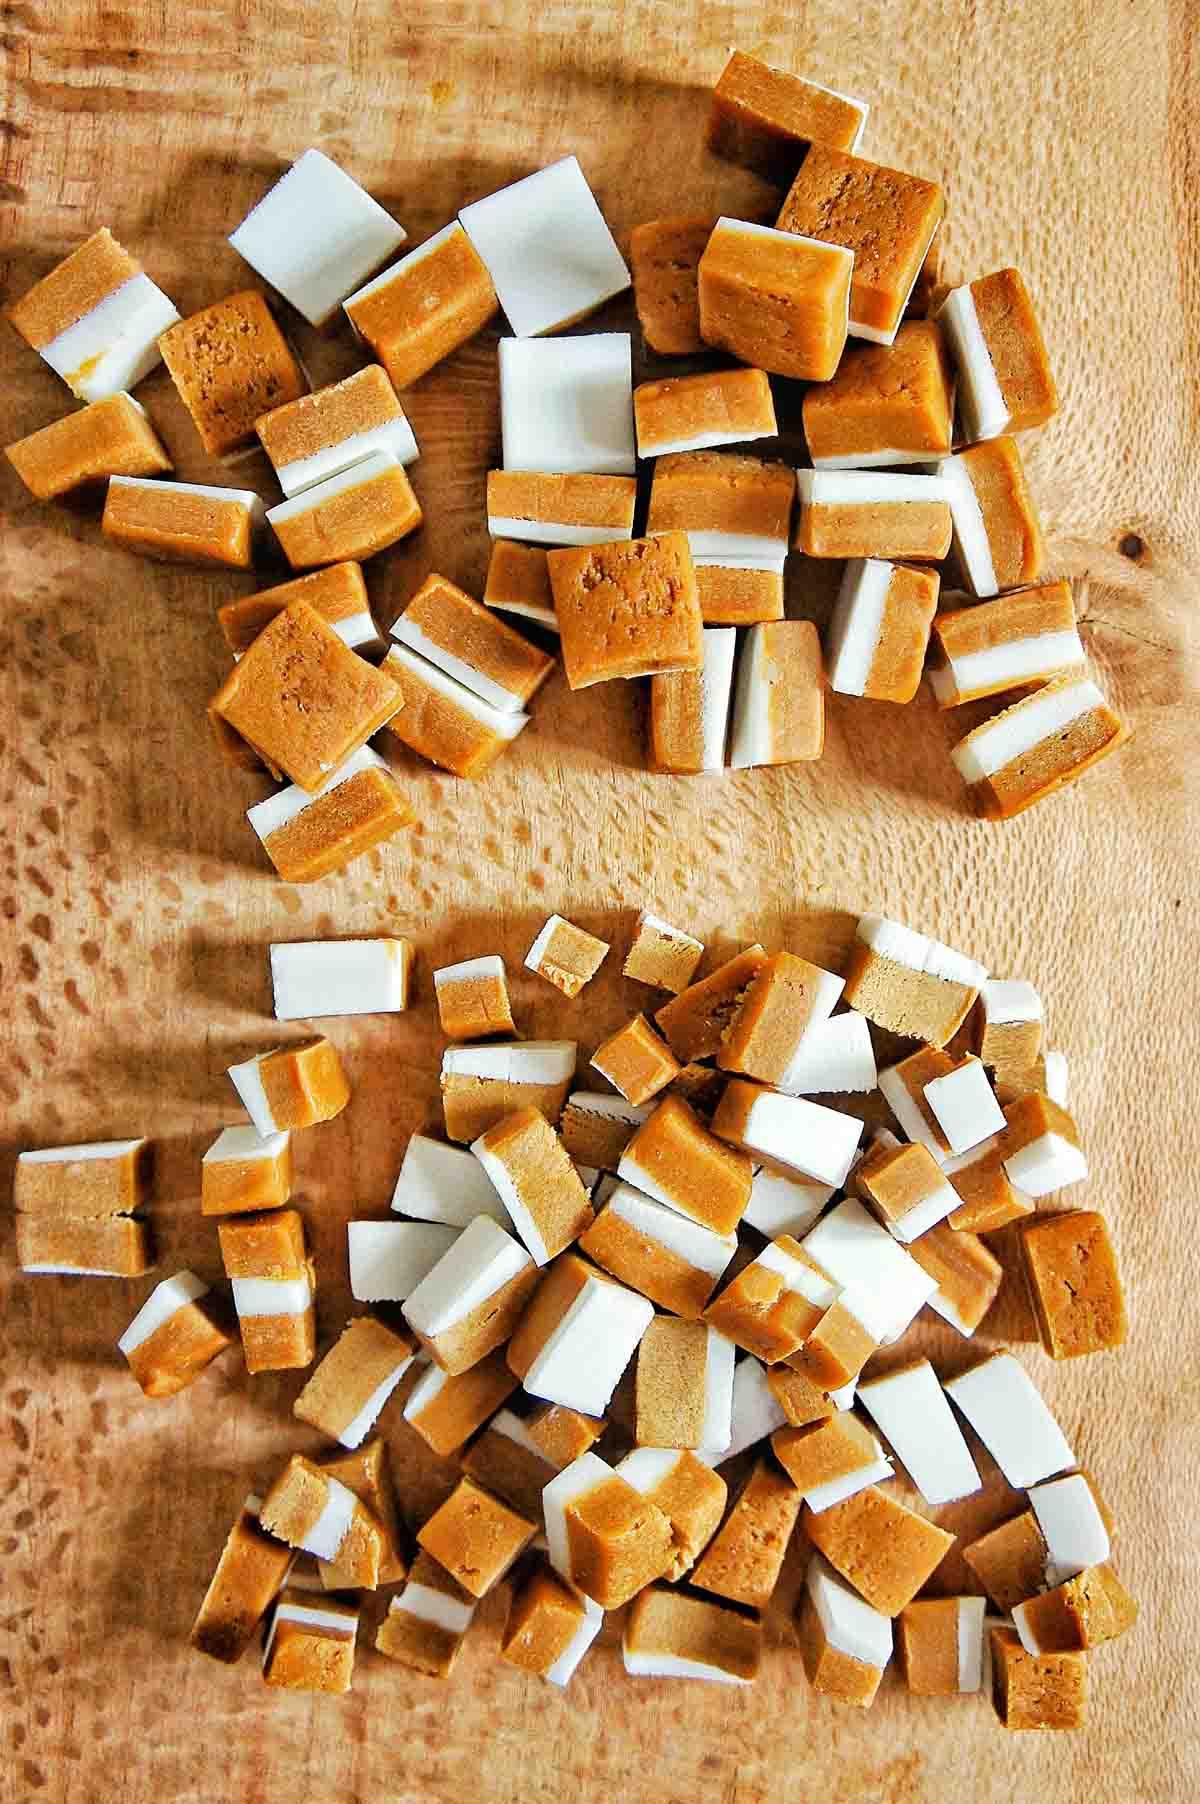 Caramels cut into pieces for caramel brownies